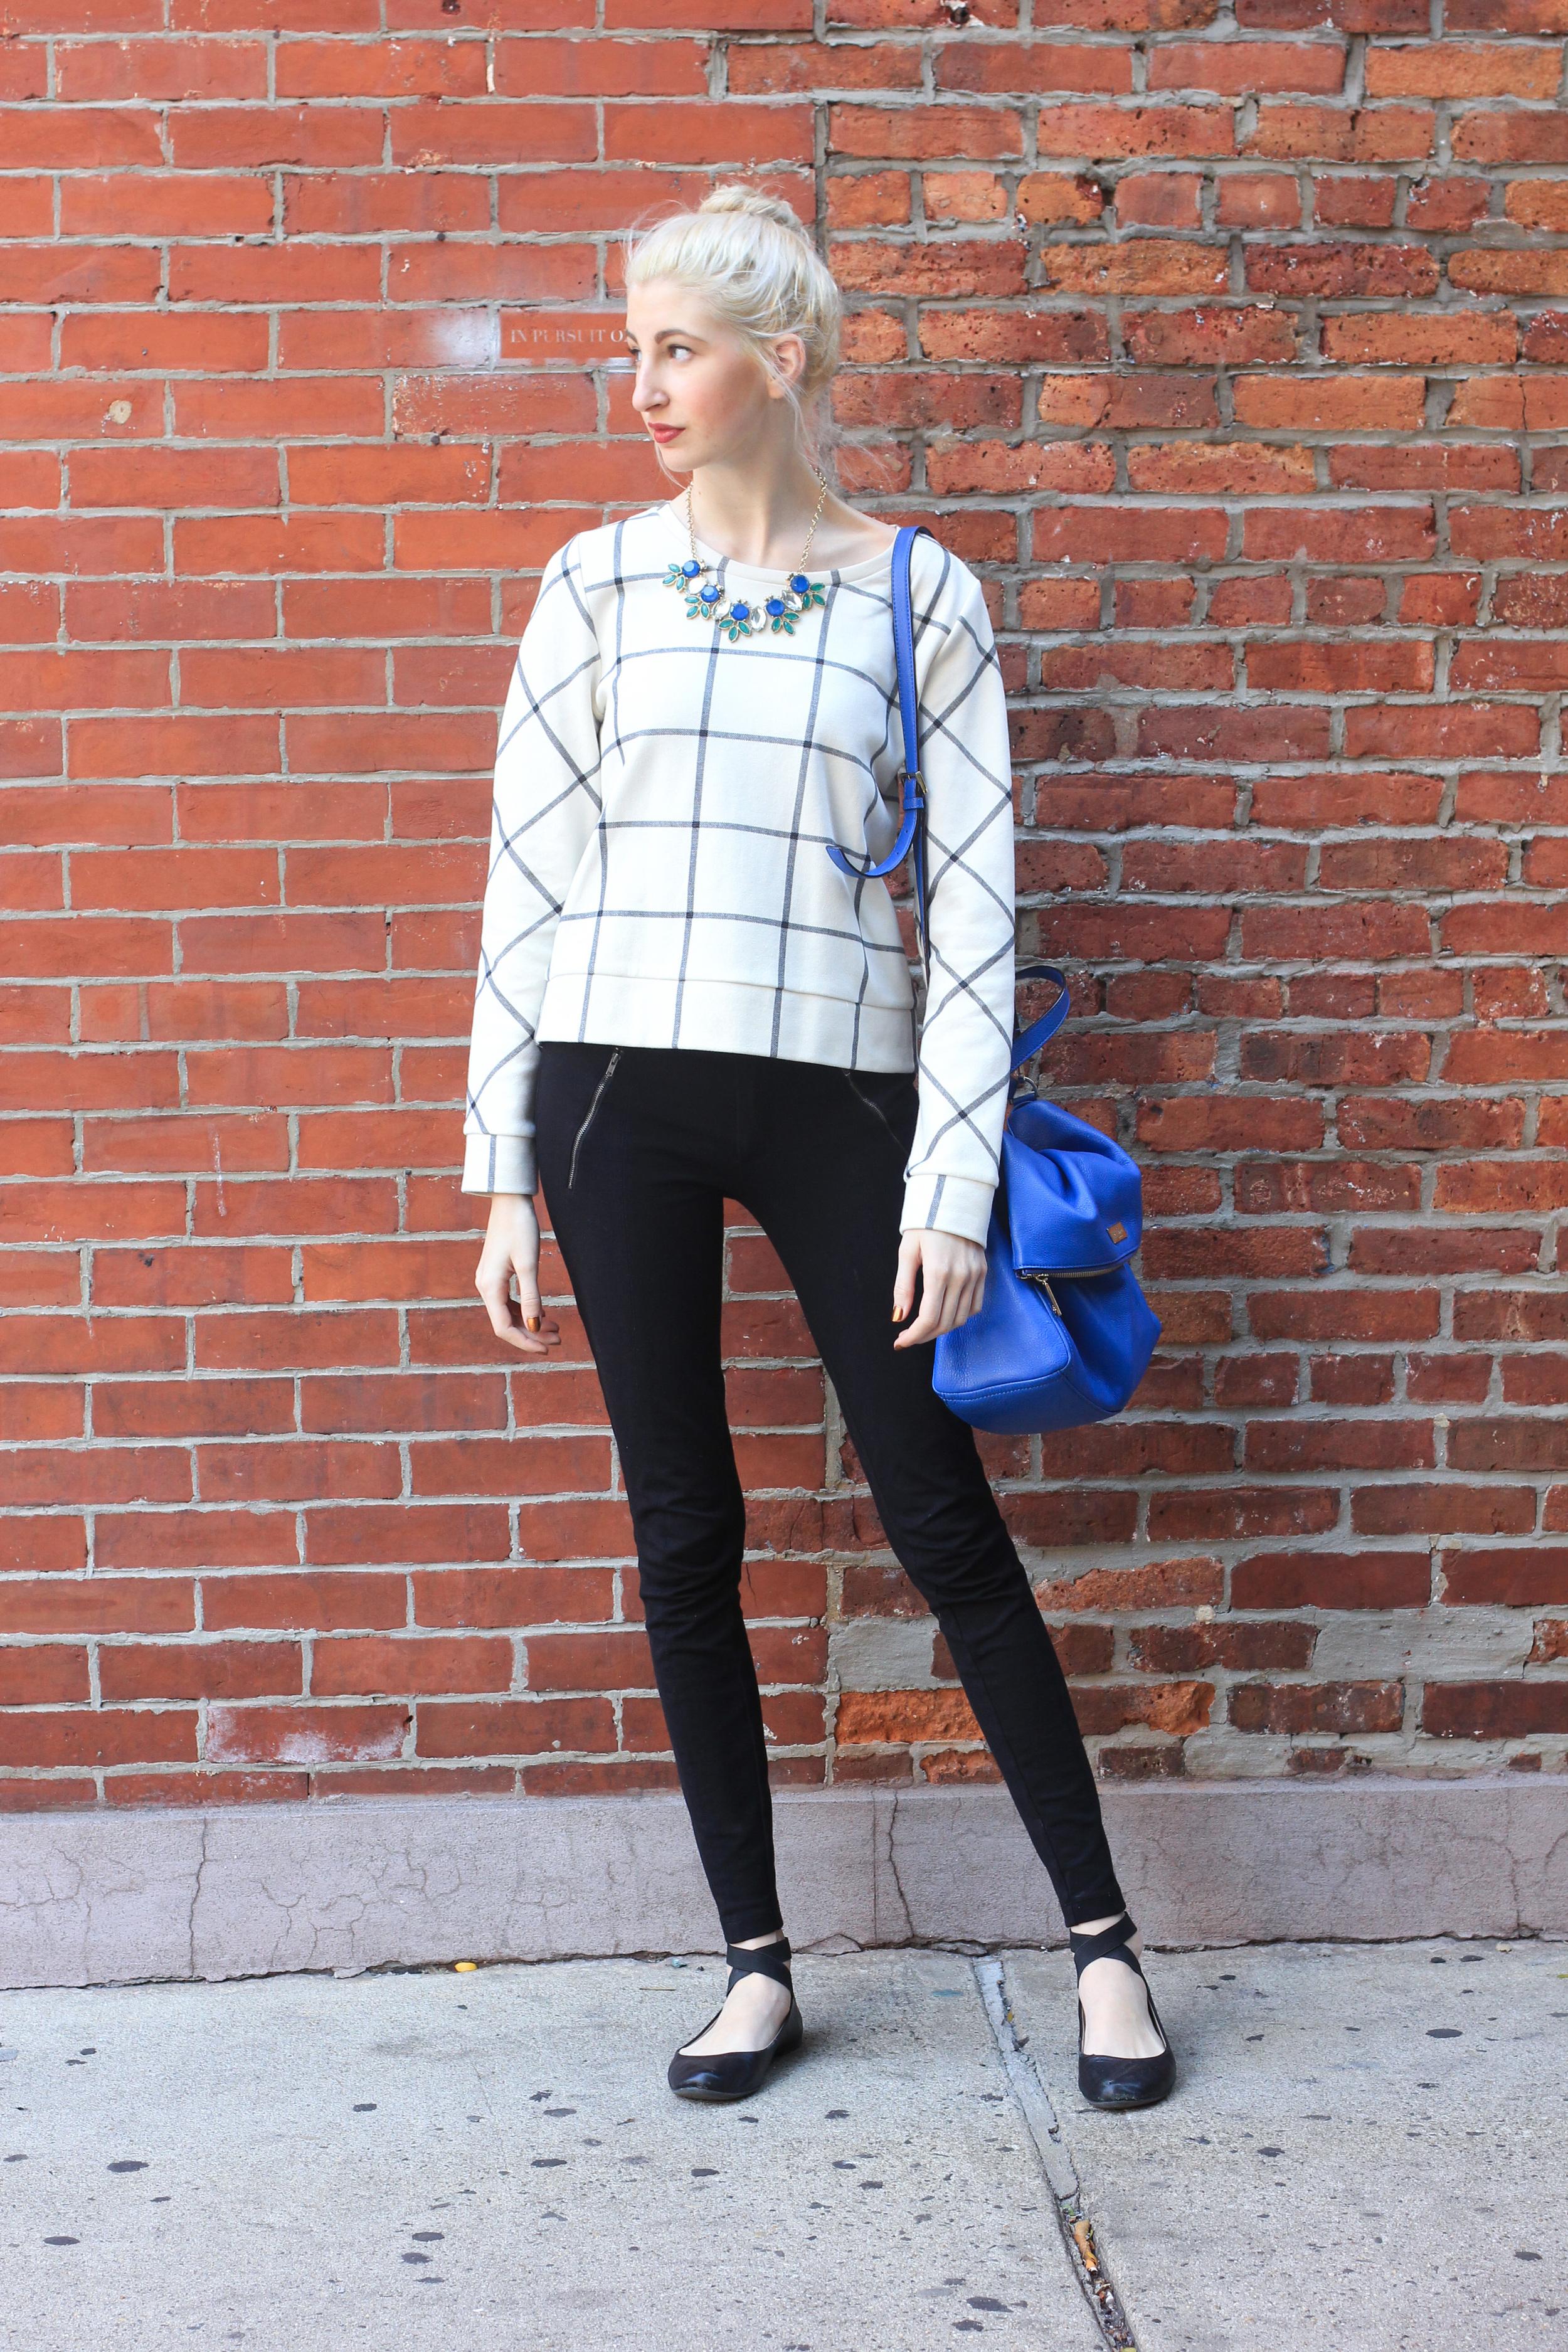 LOFT sweater, J.Crew snap front pixie pants, black ballet flats, Forever21 necklace, kate spade cobalt bag